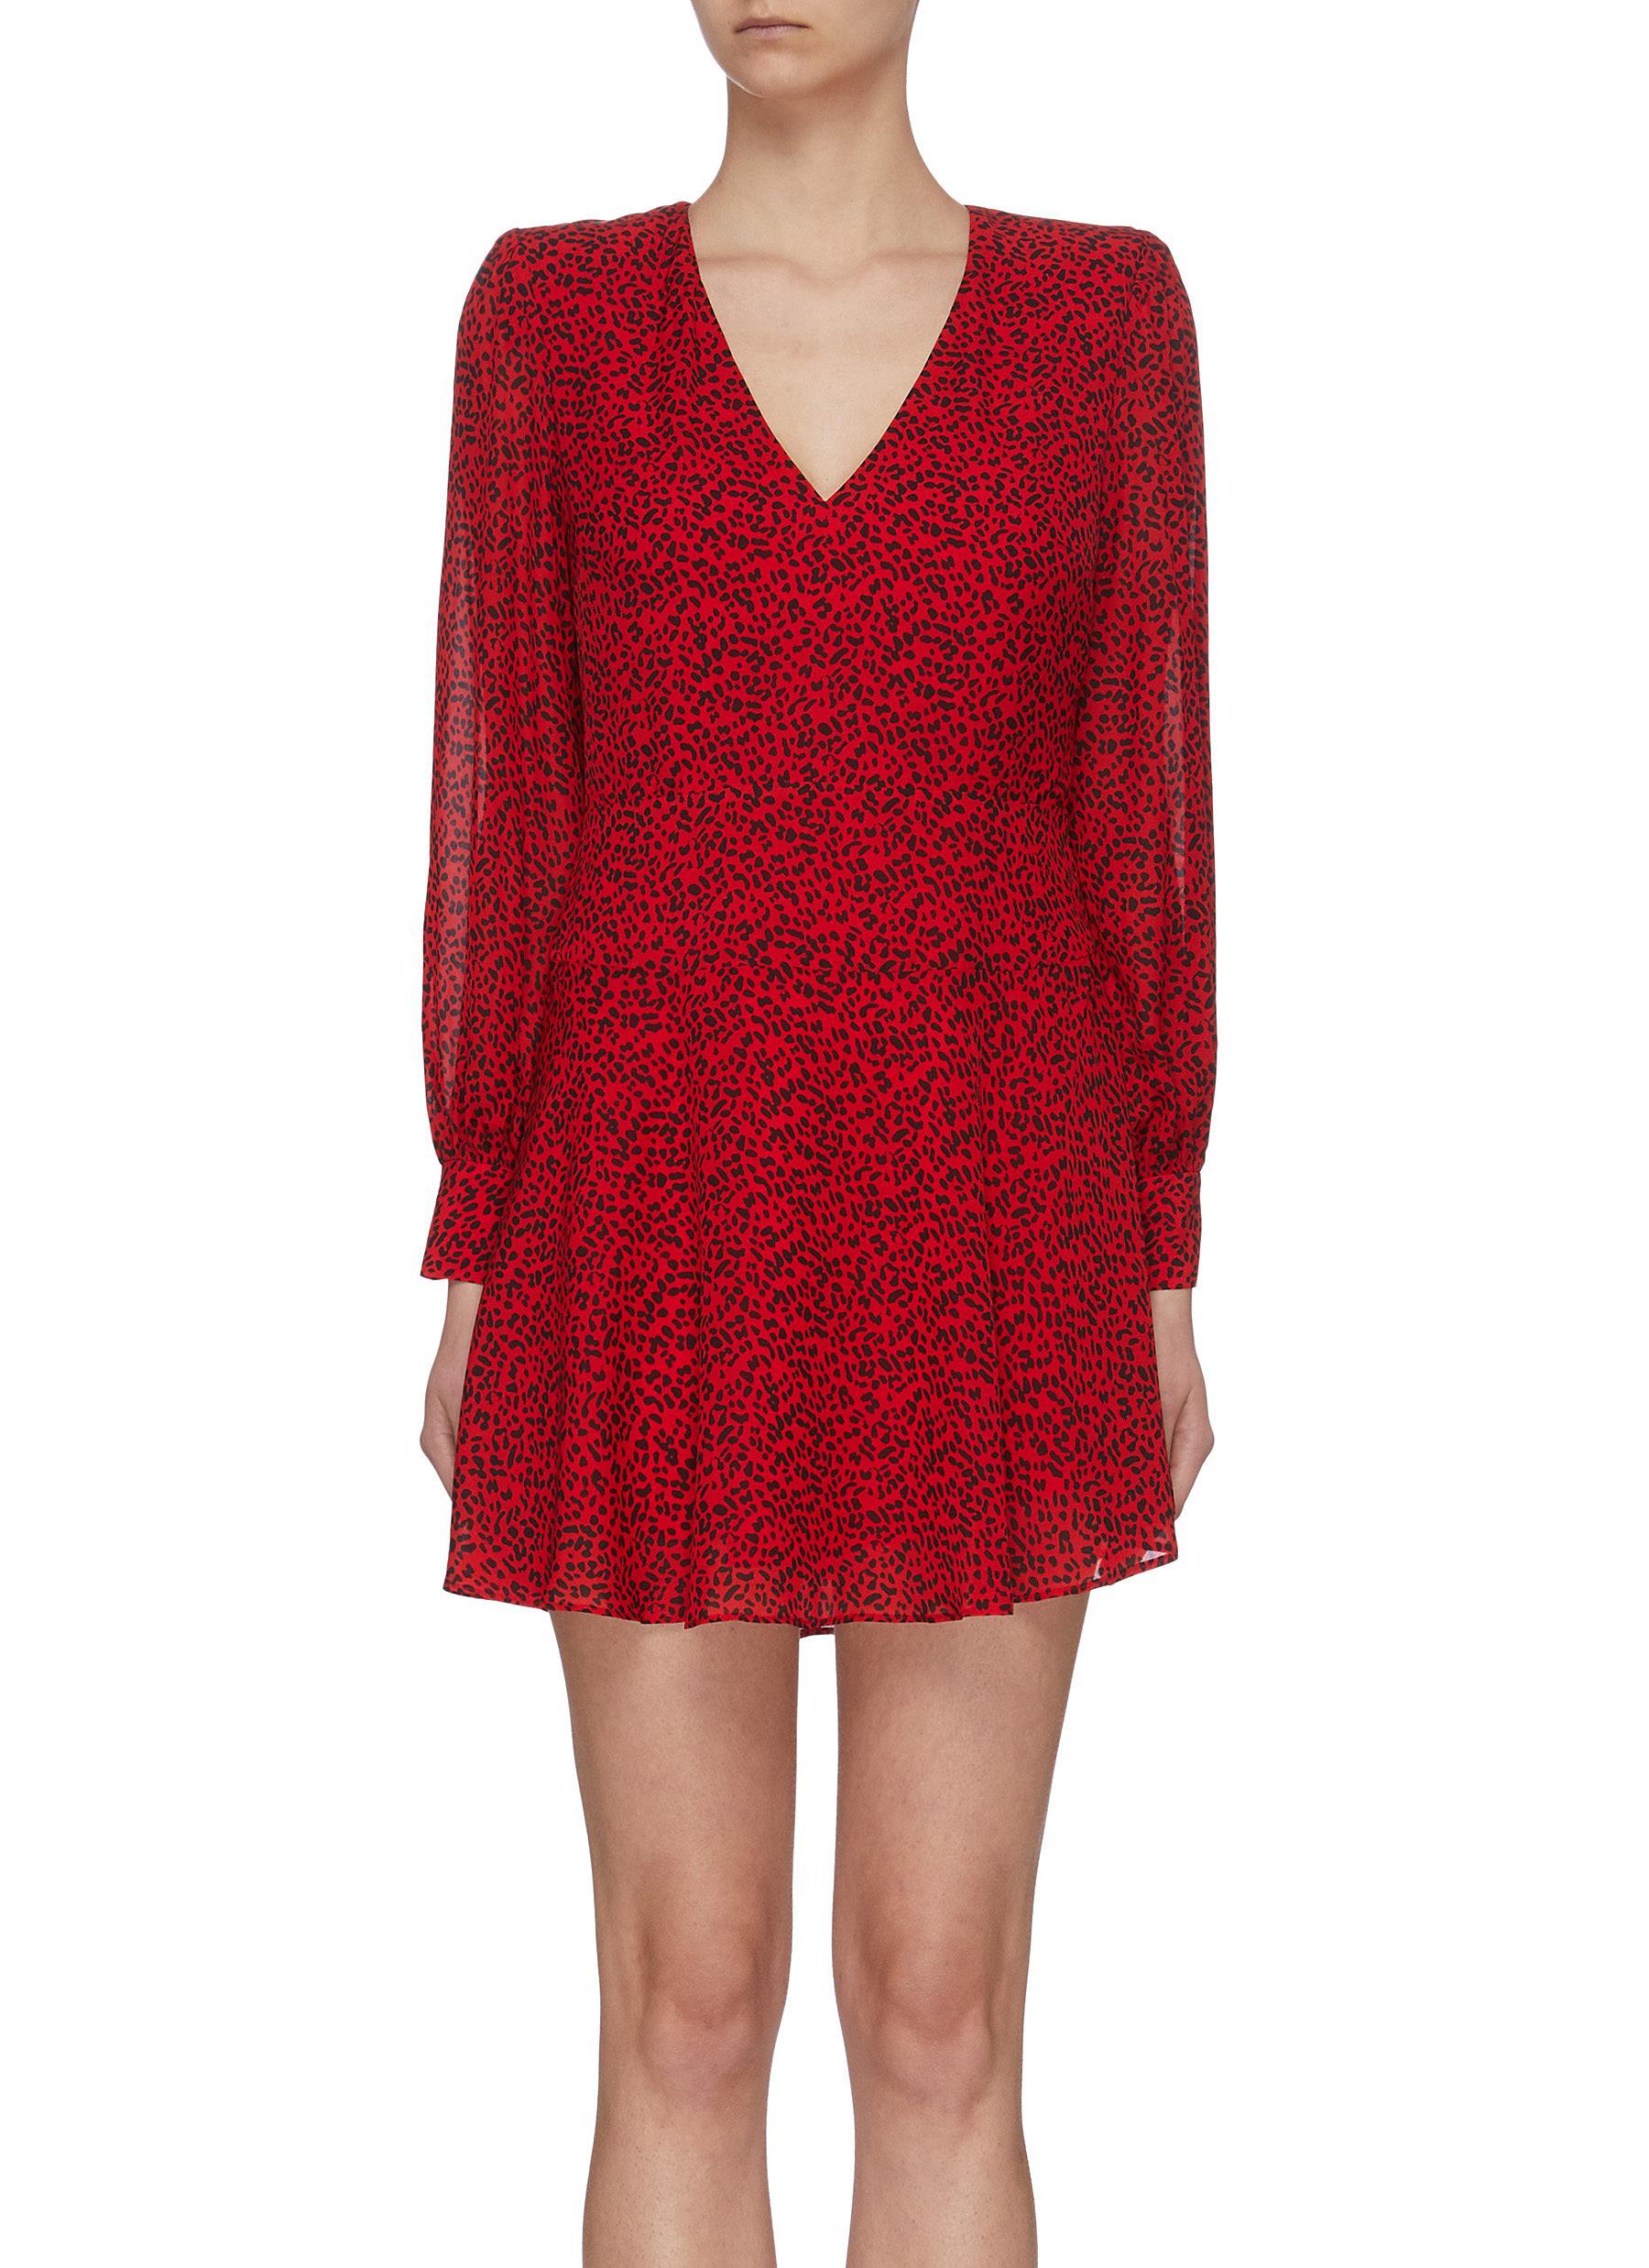 Buy Alice + Olivia Dresses 'Poly' leopard print sheer dress